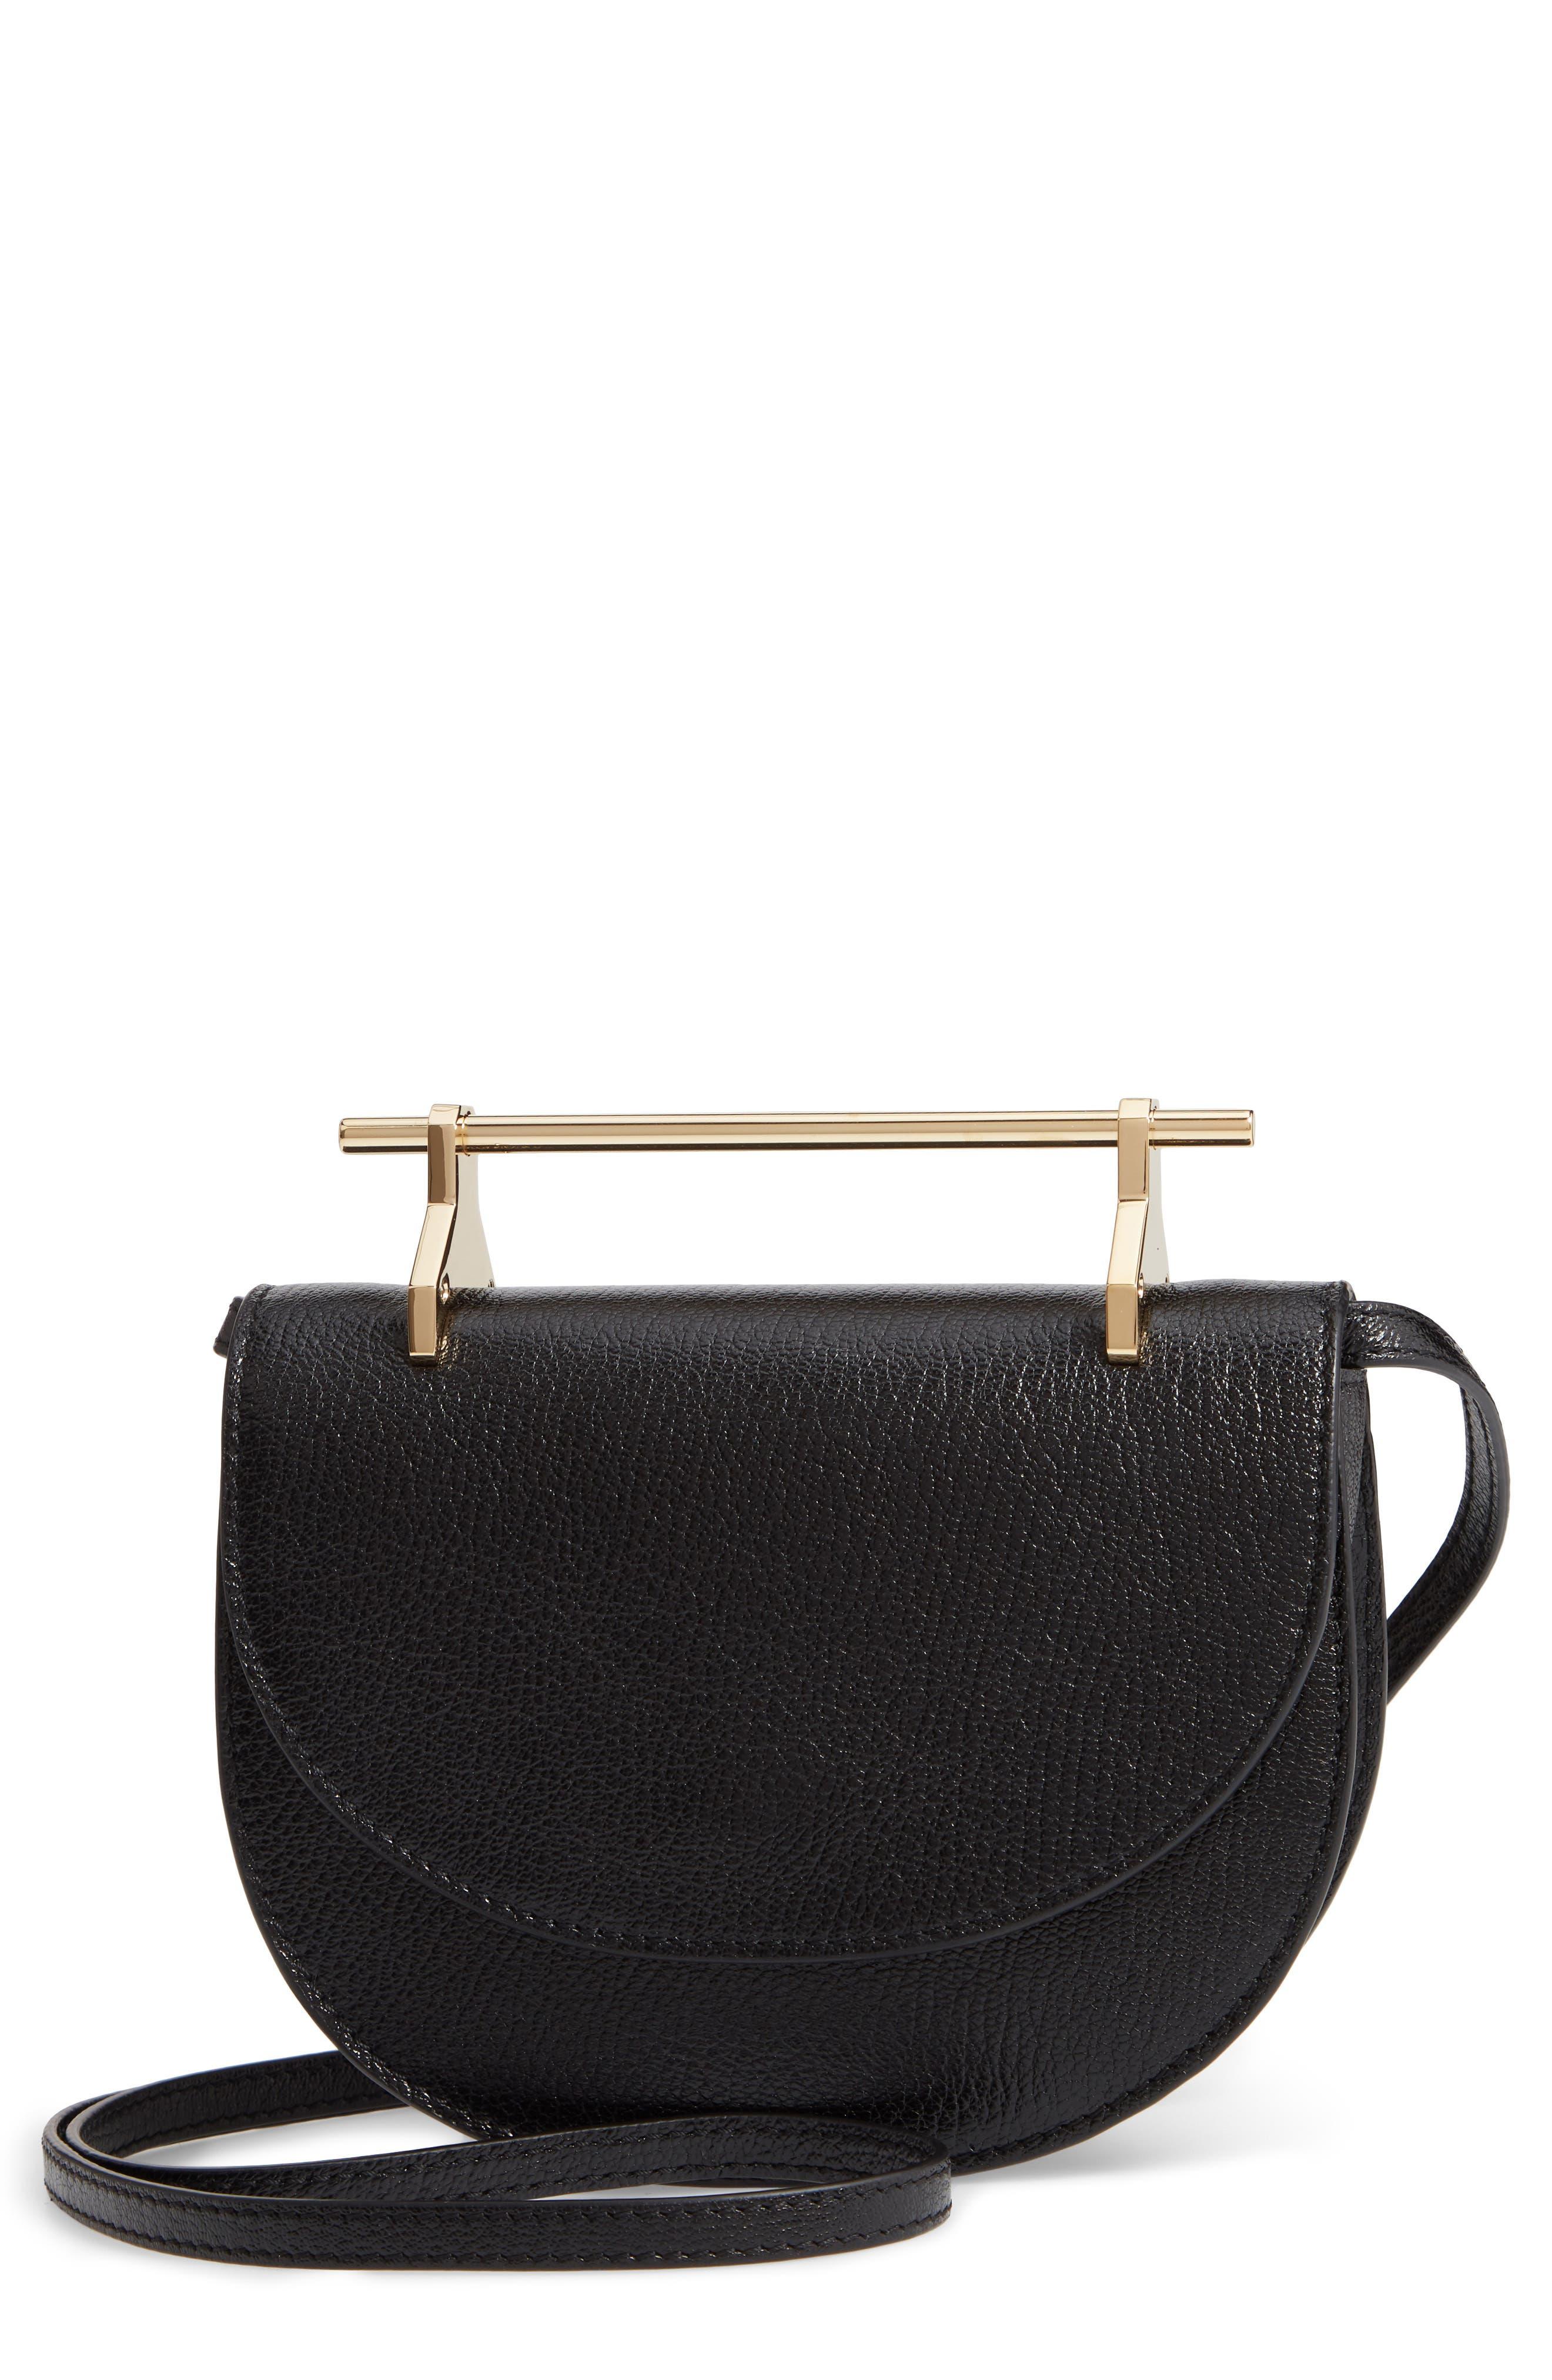 Half Moon Lux Calfskin Leather Crossbody Bag,                         Main,                         color, 001